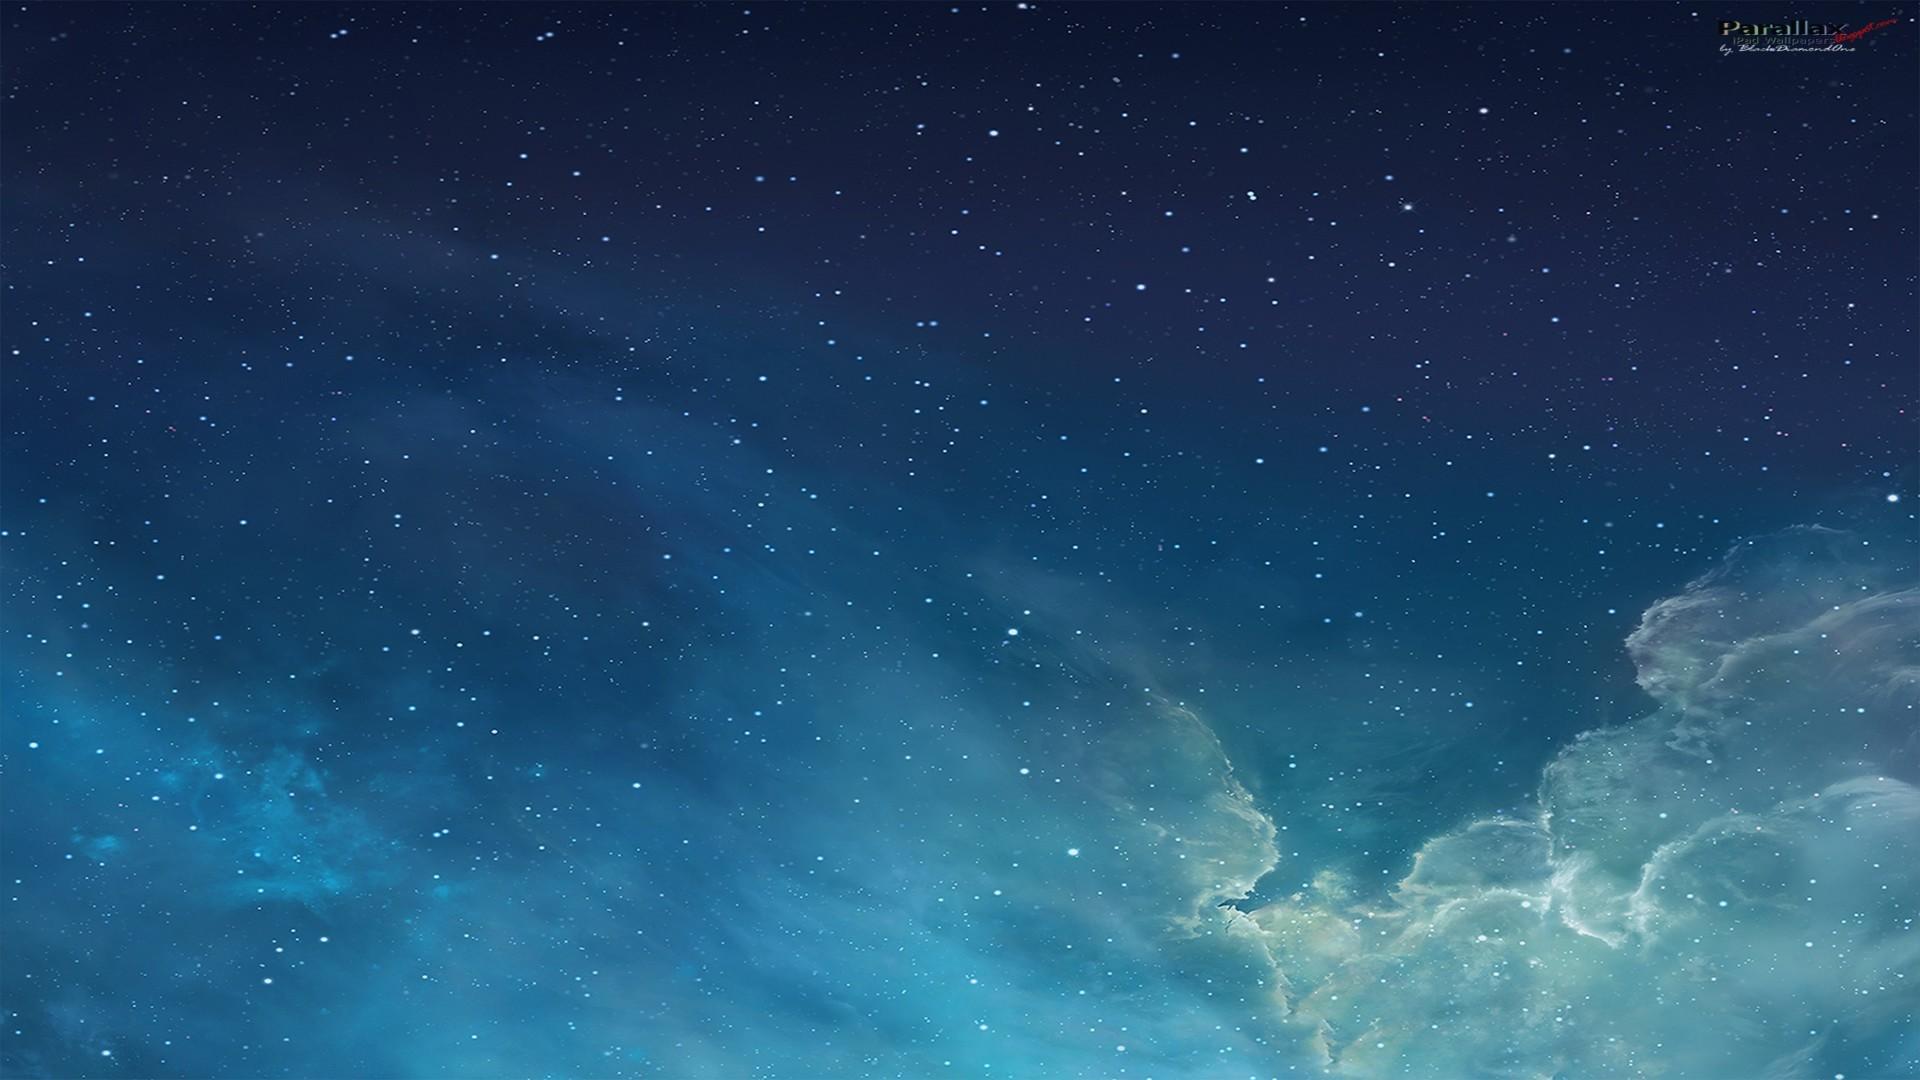 Starry Night Desktop Background 73 Pictures